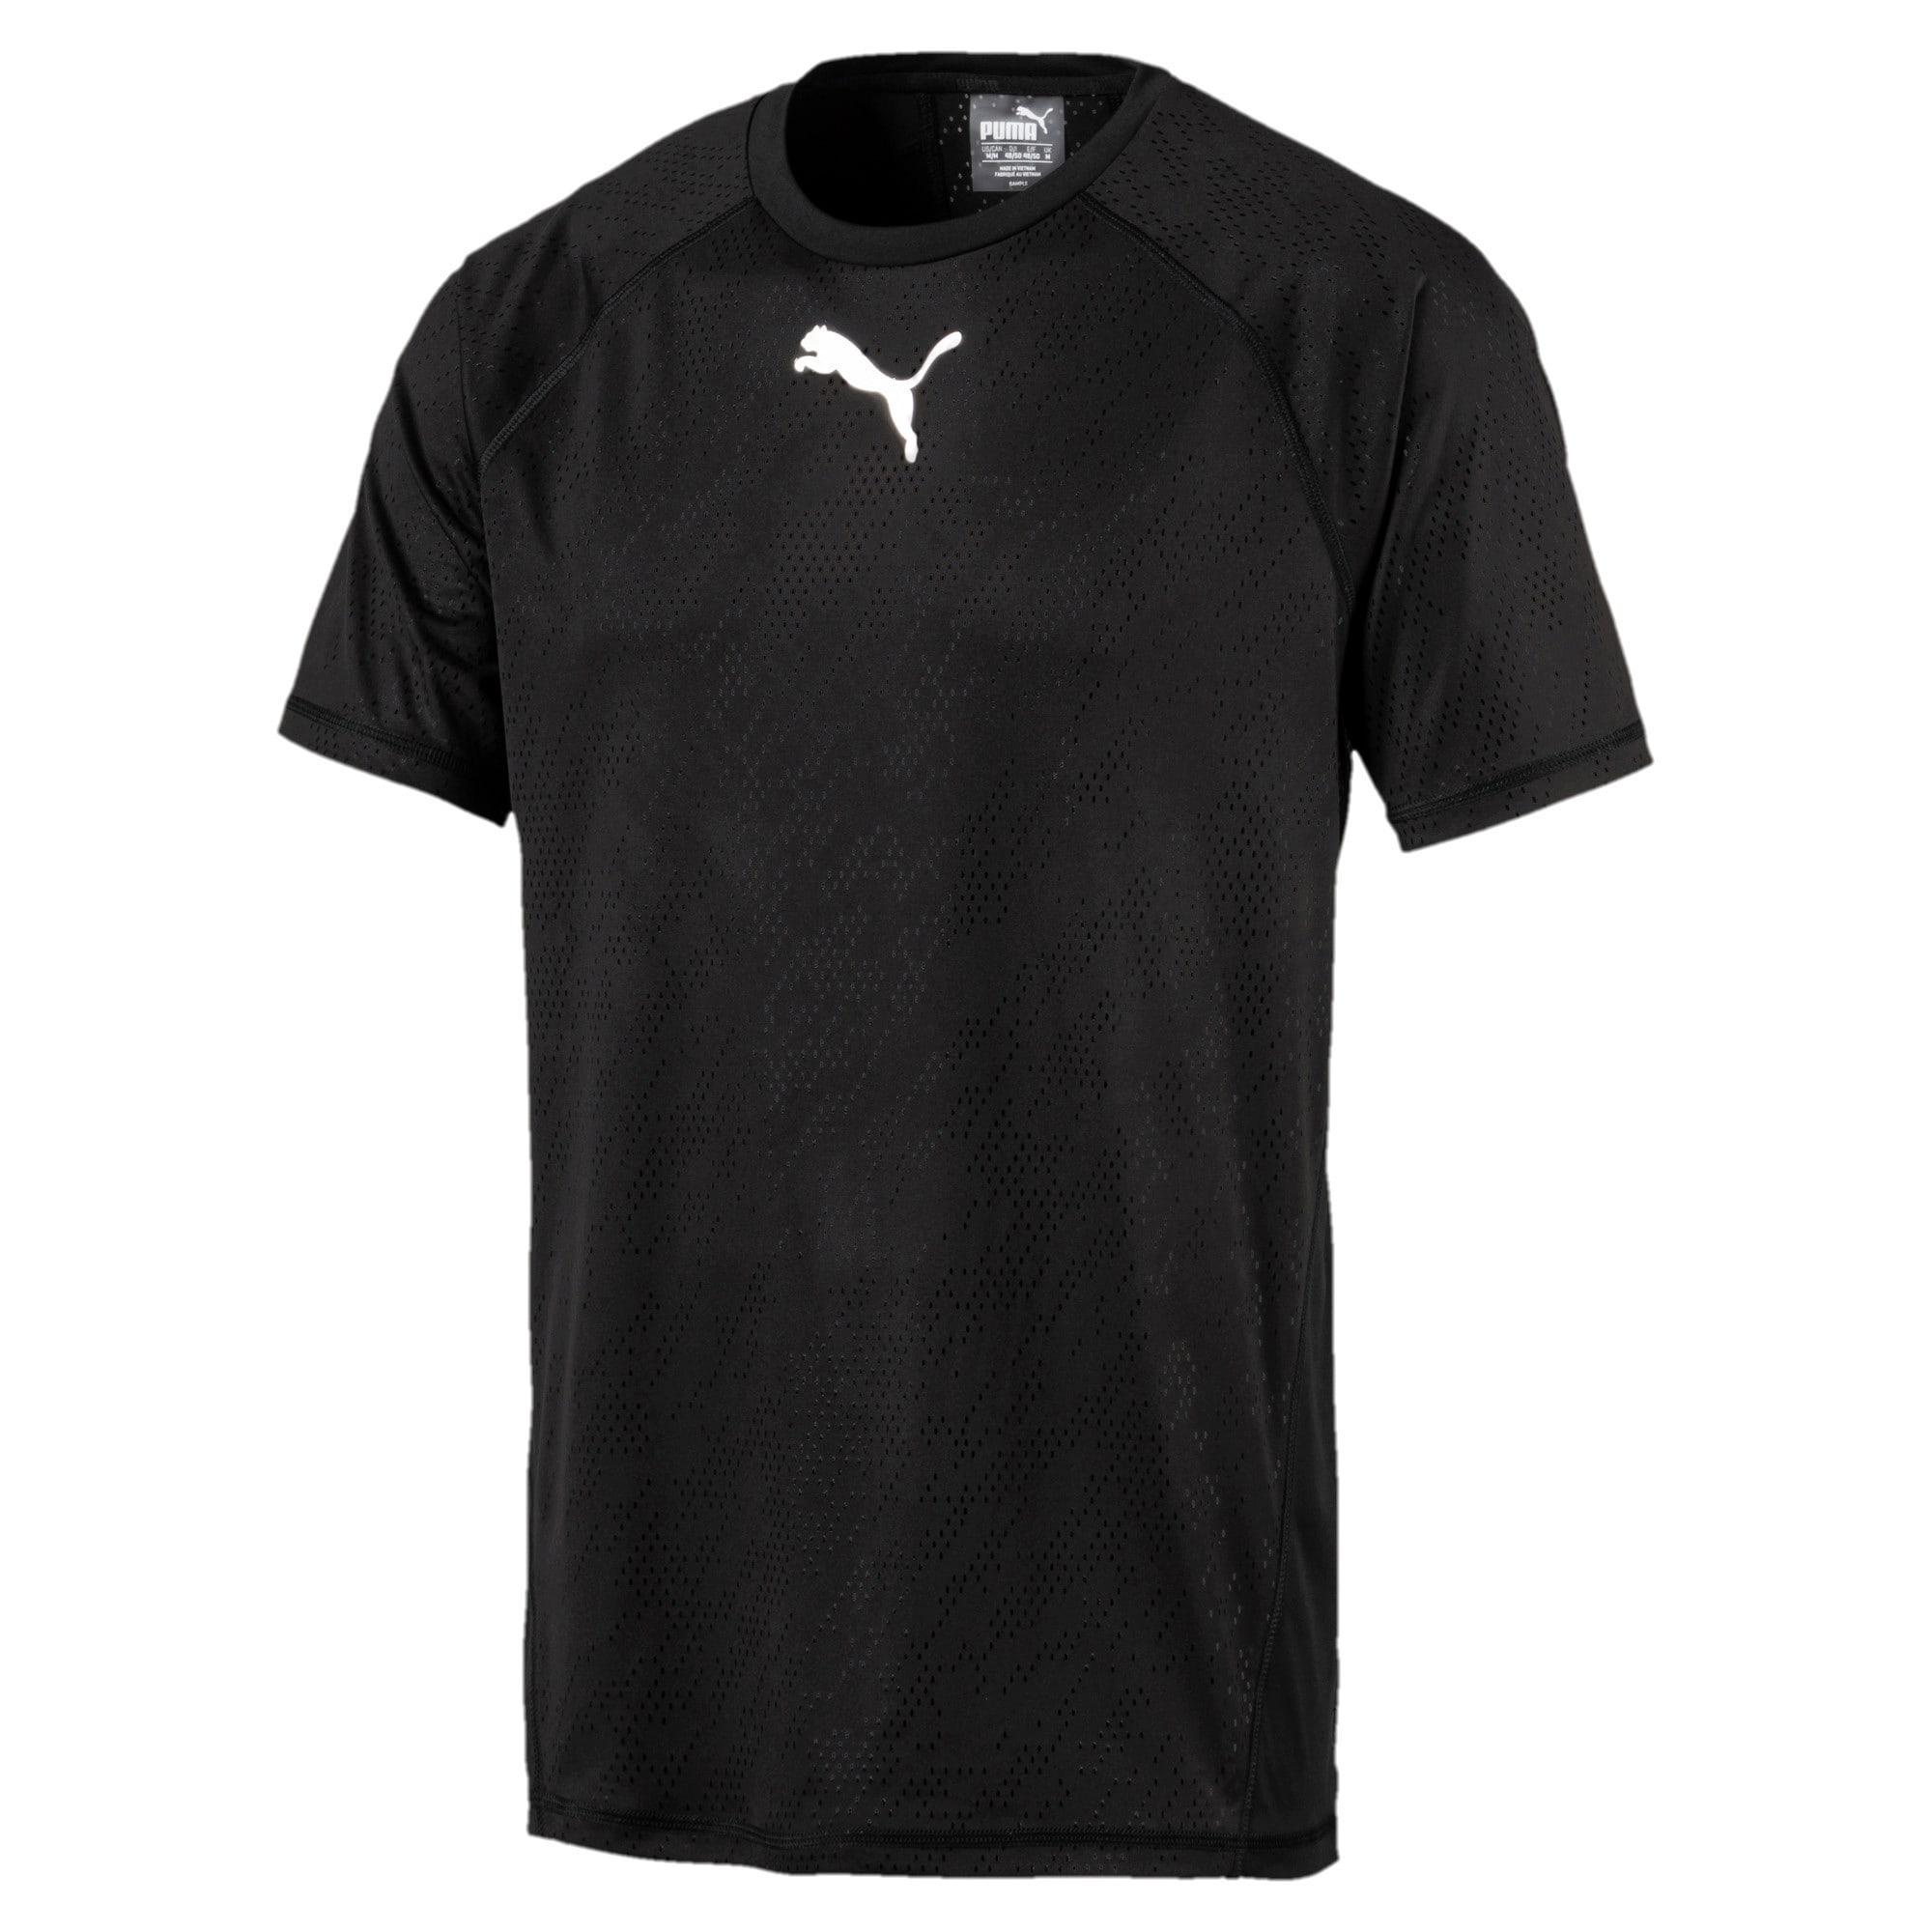 Thumbnail 5 of Active Training Men's Vent T-Shirt, Puma Black, medium-IND